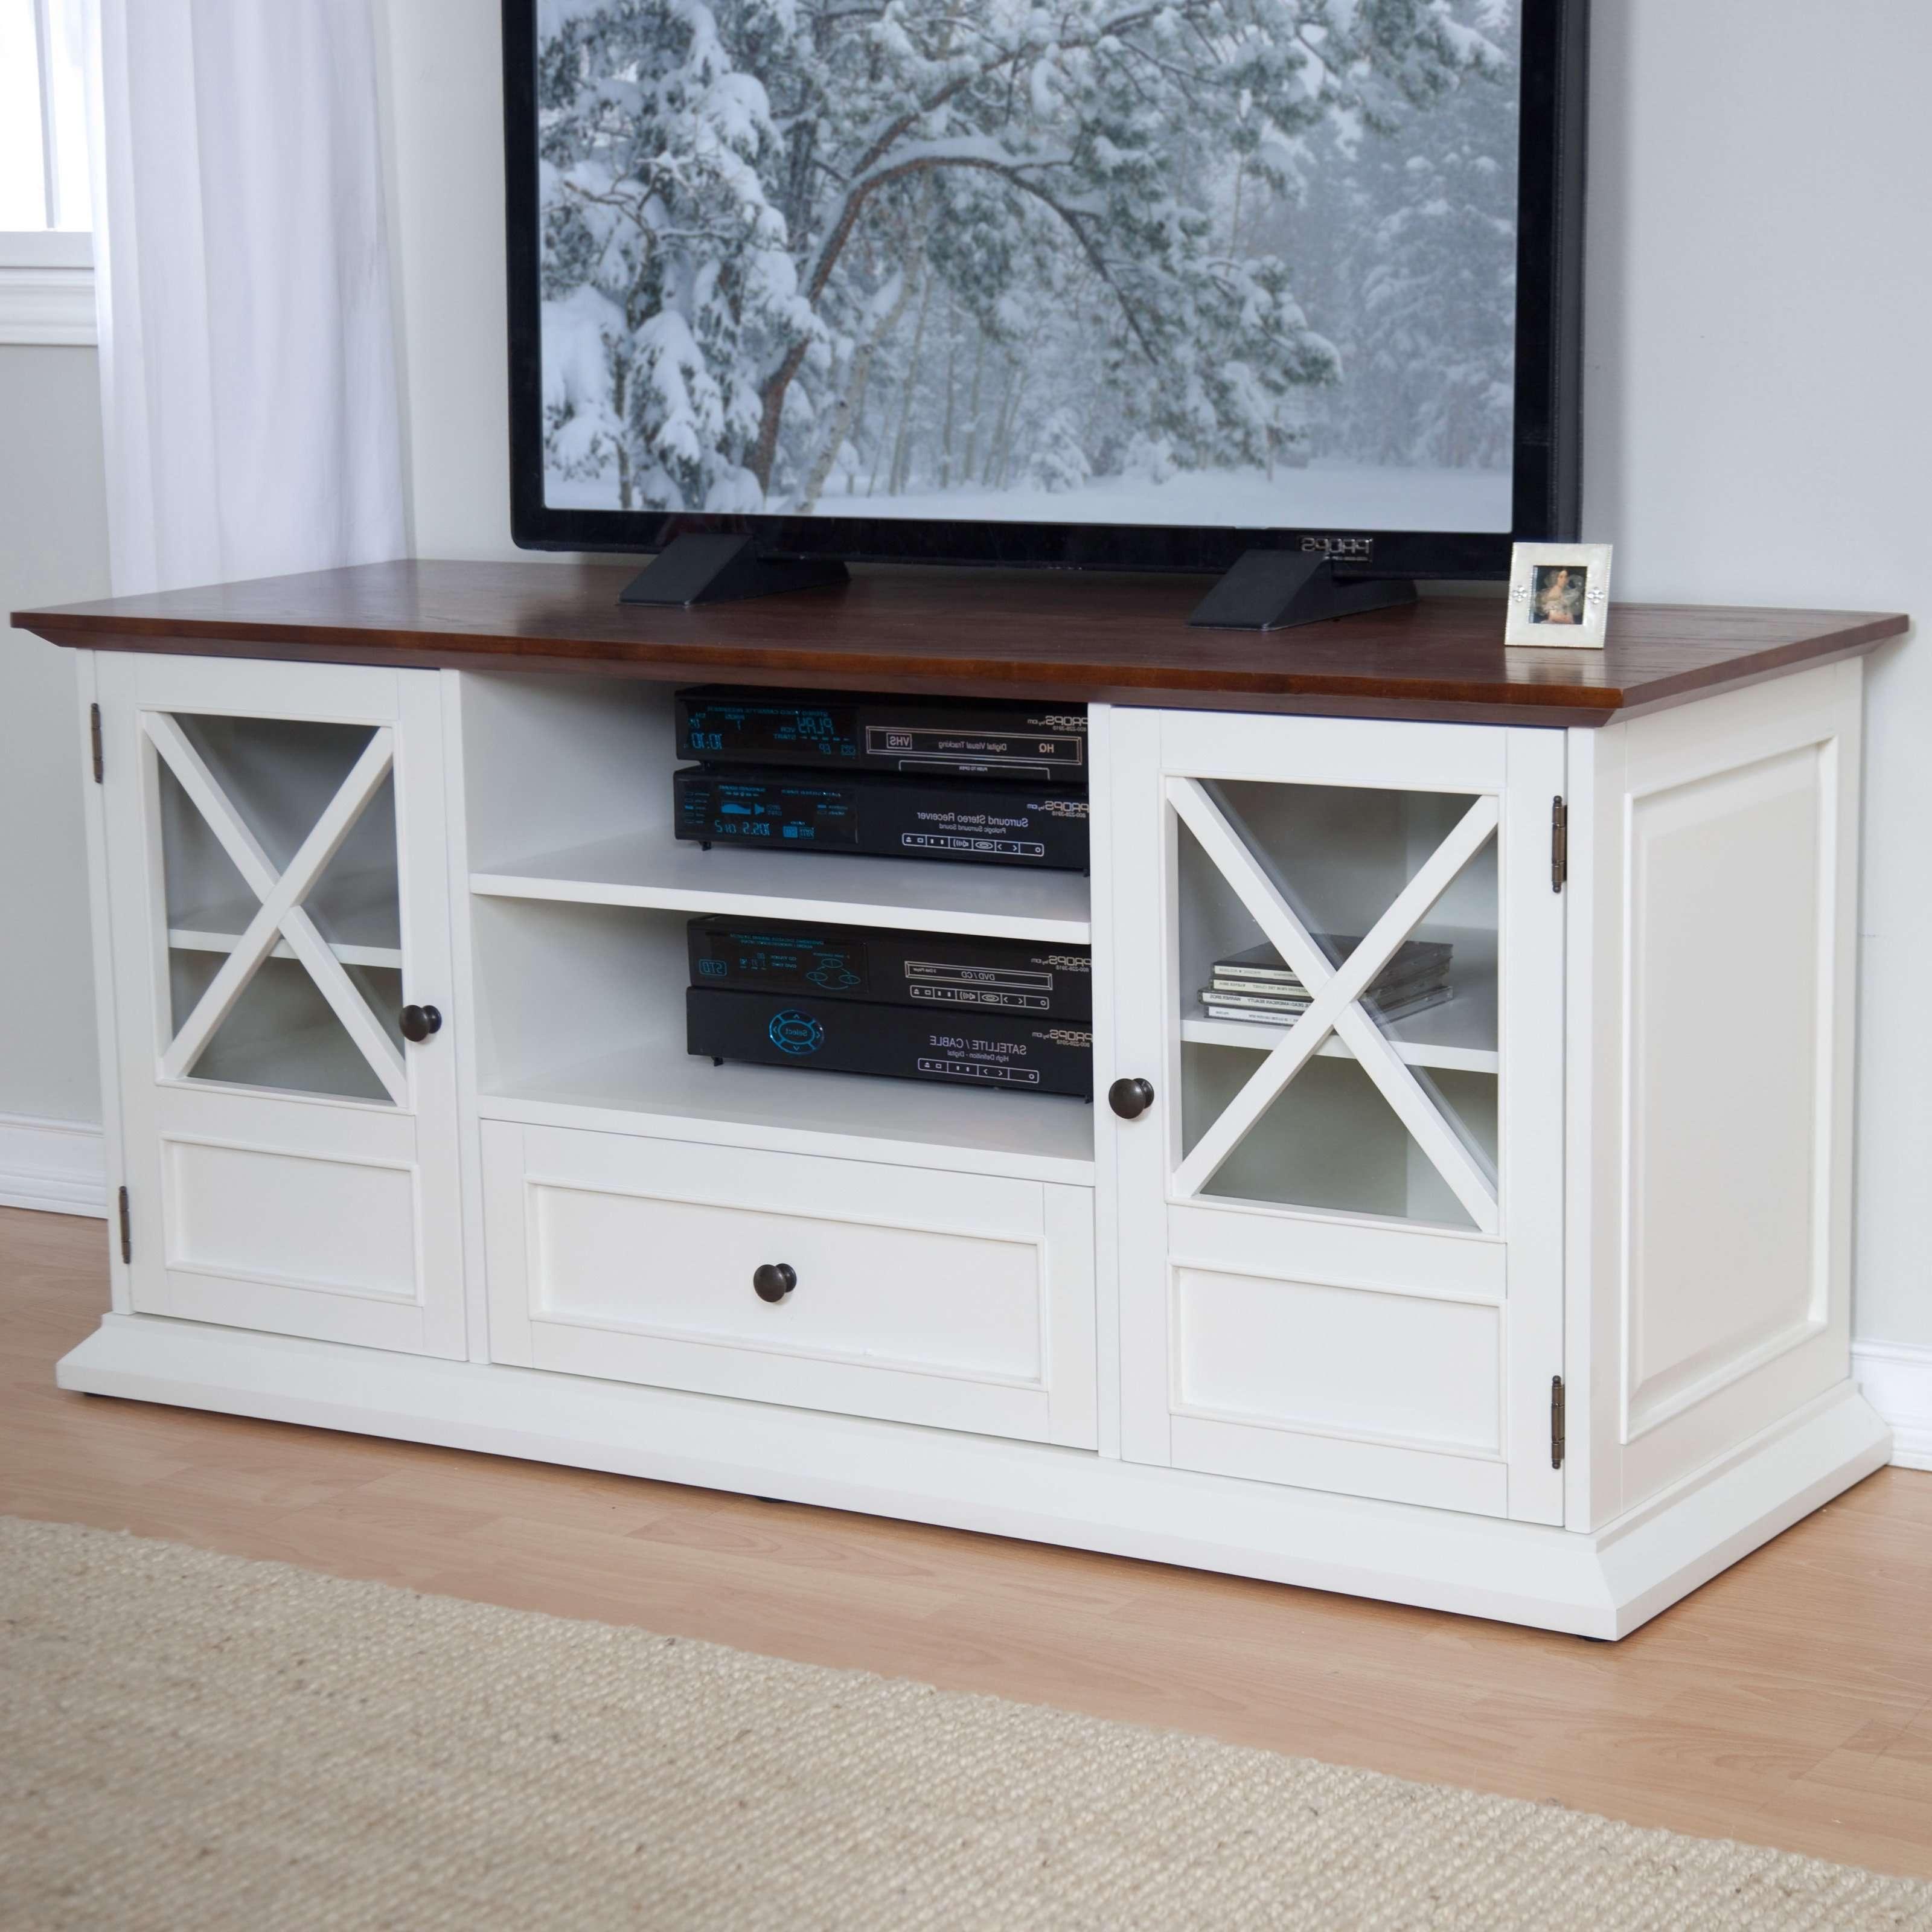 Belham Living Hampton Tv Stand – White/oak | Hayneedle Inside Tv Stands In Oak (View 5 of 15)